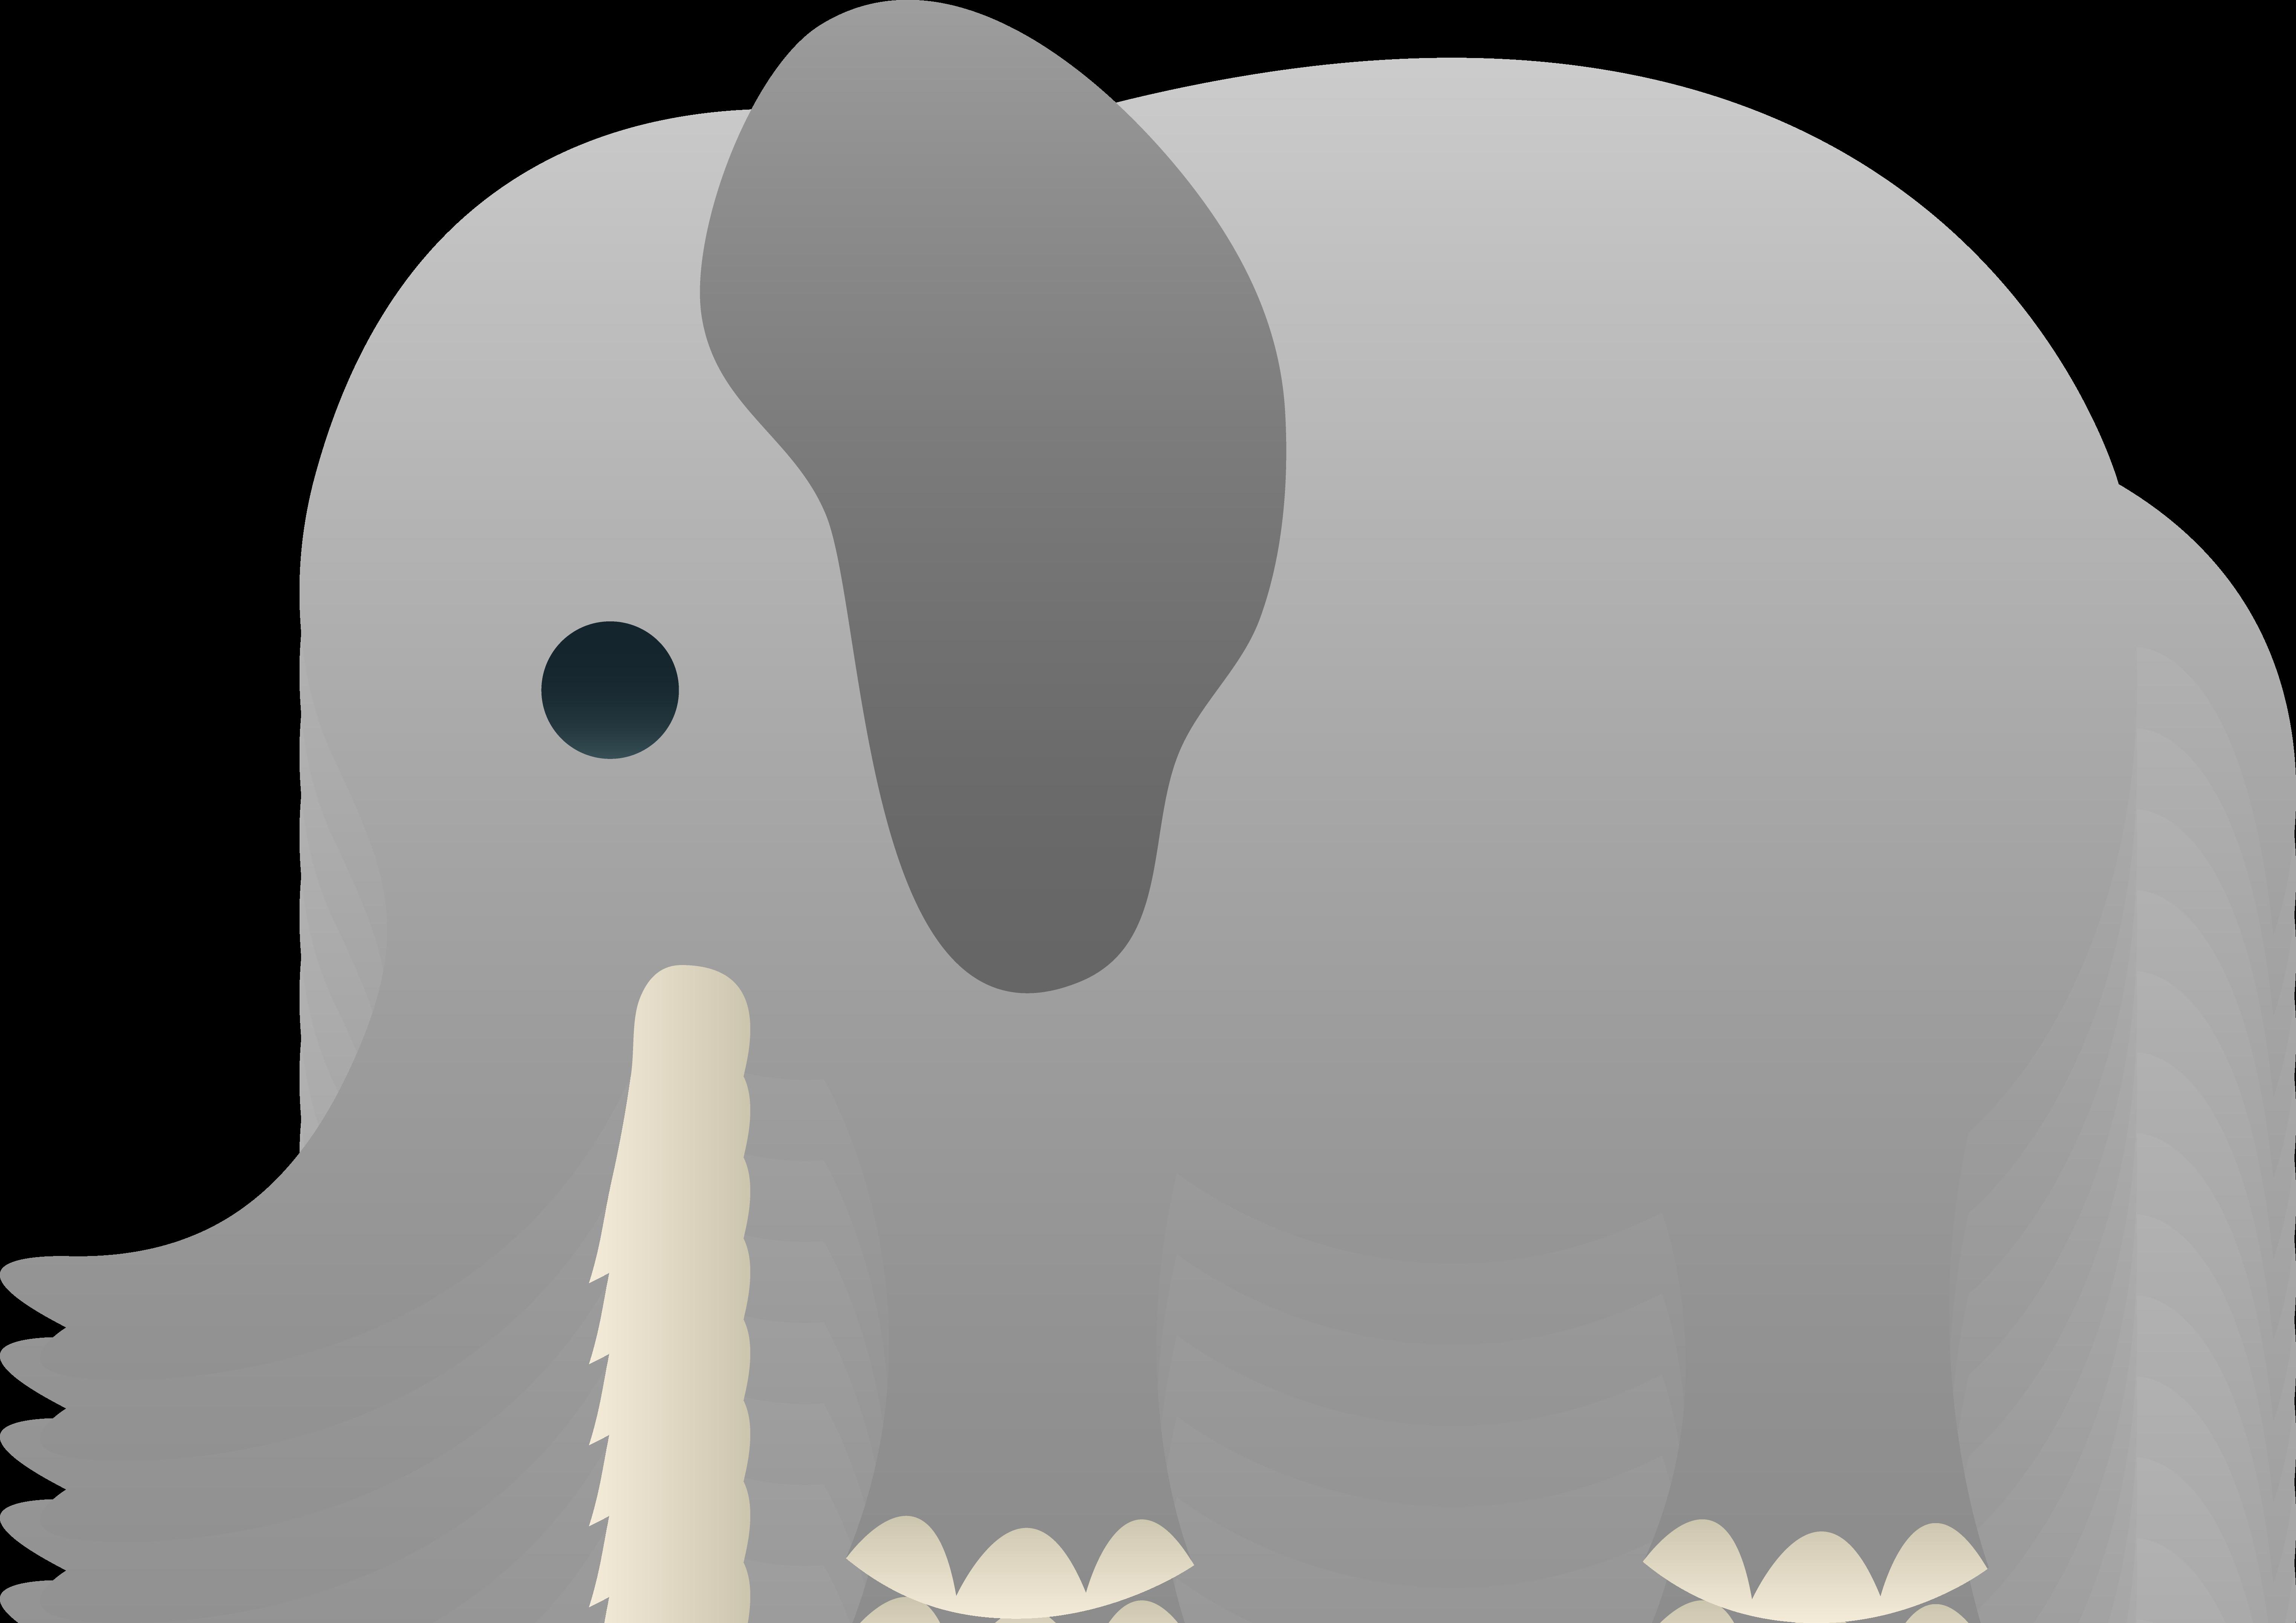 1 clipart elephant. Grey